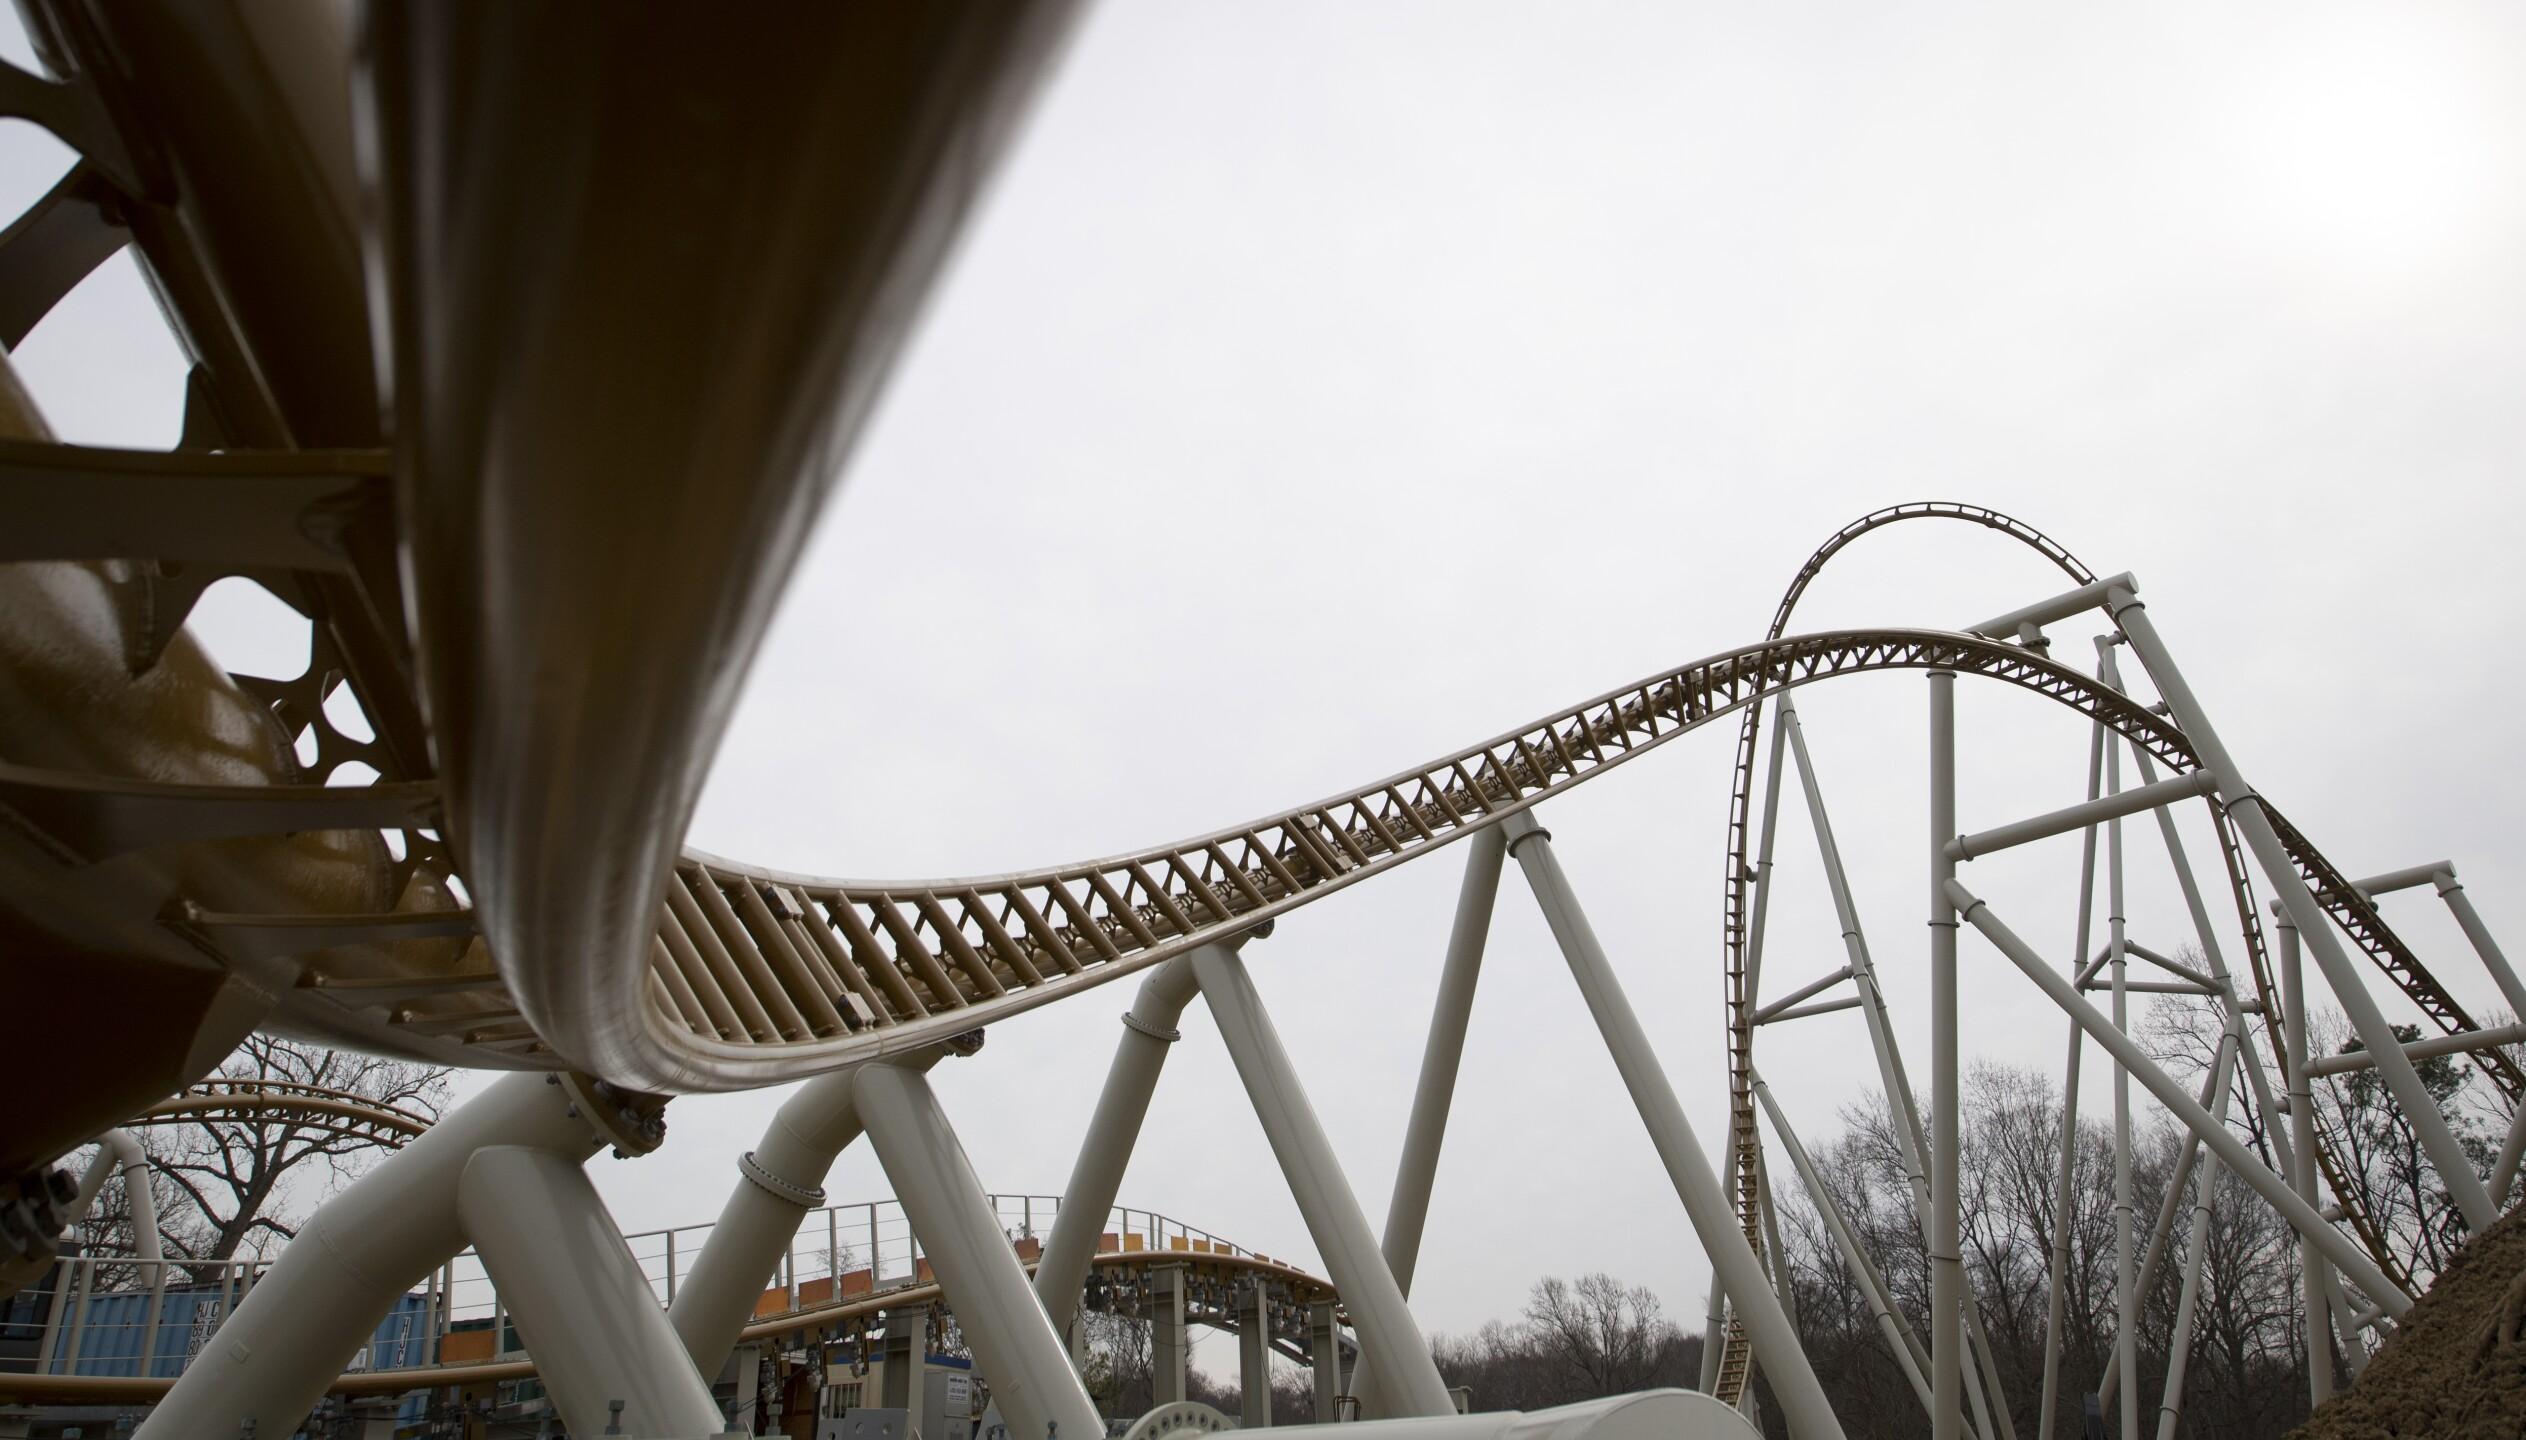 Photos: First look at Busch Gardens Williamsburg's newest roller coaster,Pantheon